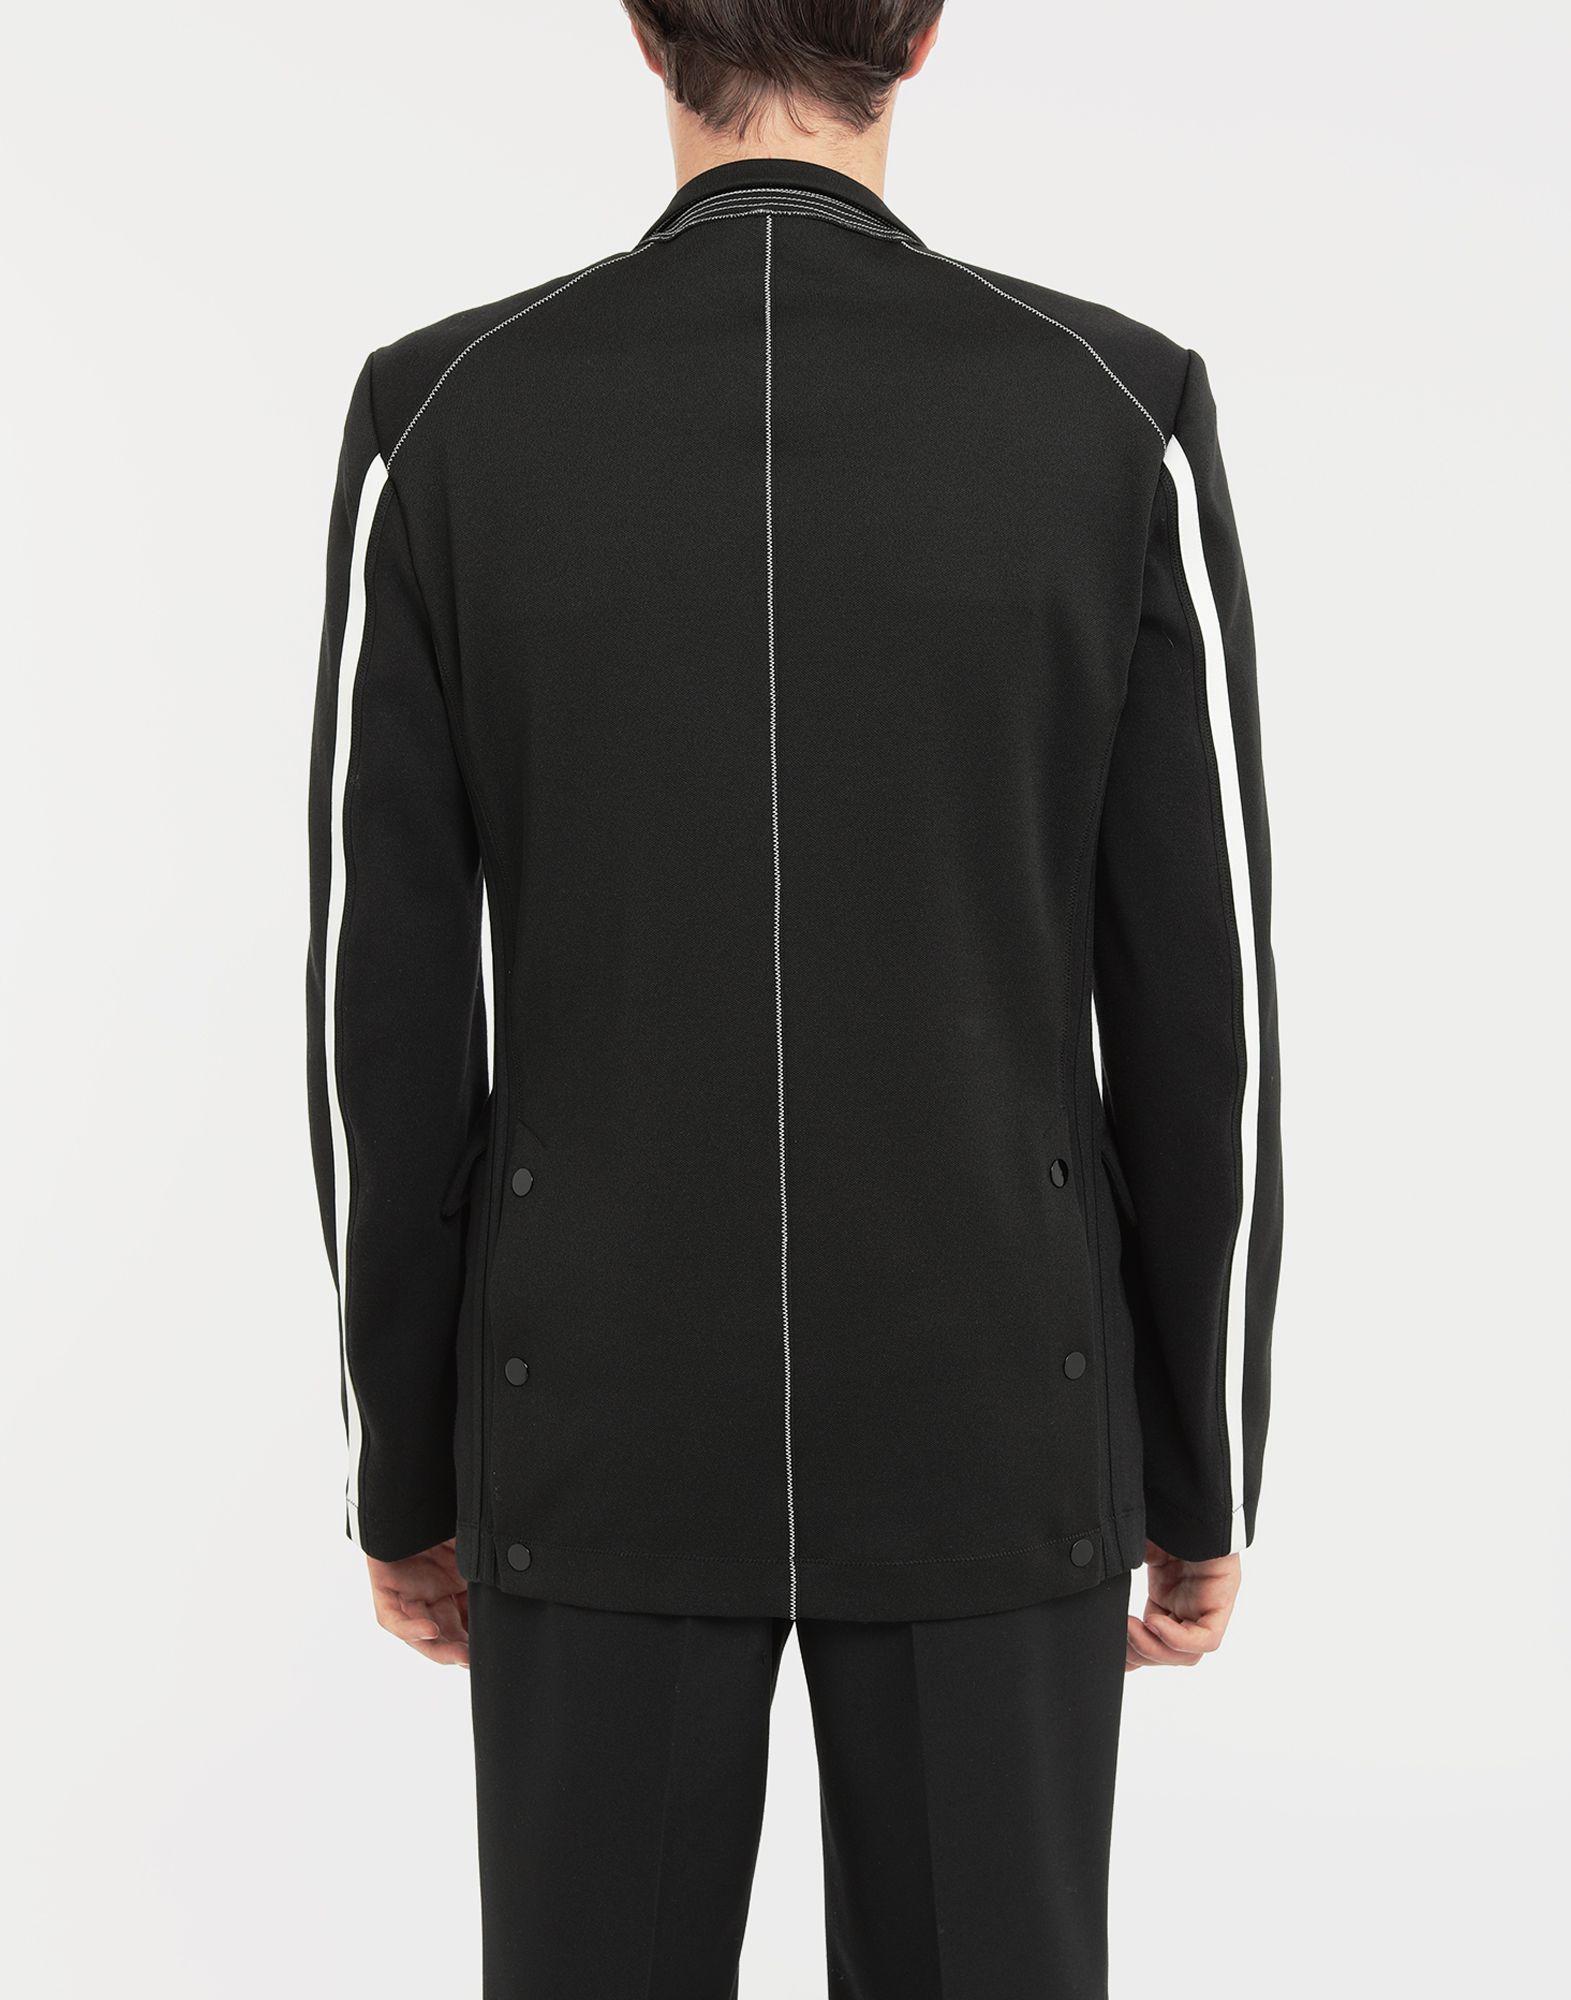 MAISON MARGIELA Exposed seam jersey jacket Blazer Man e